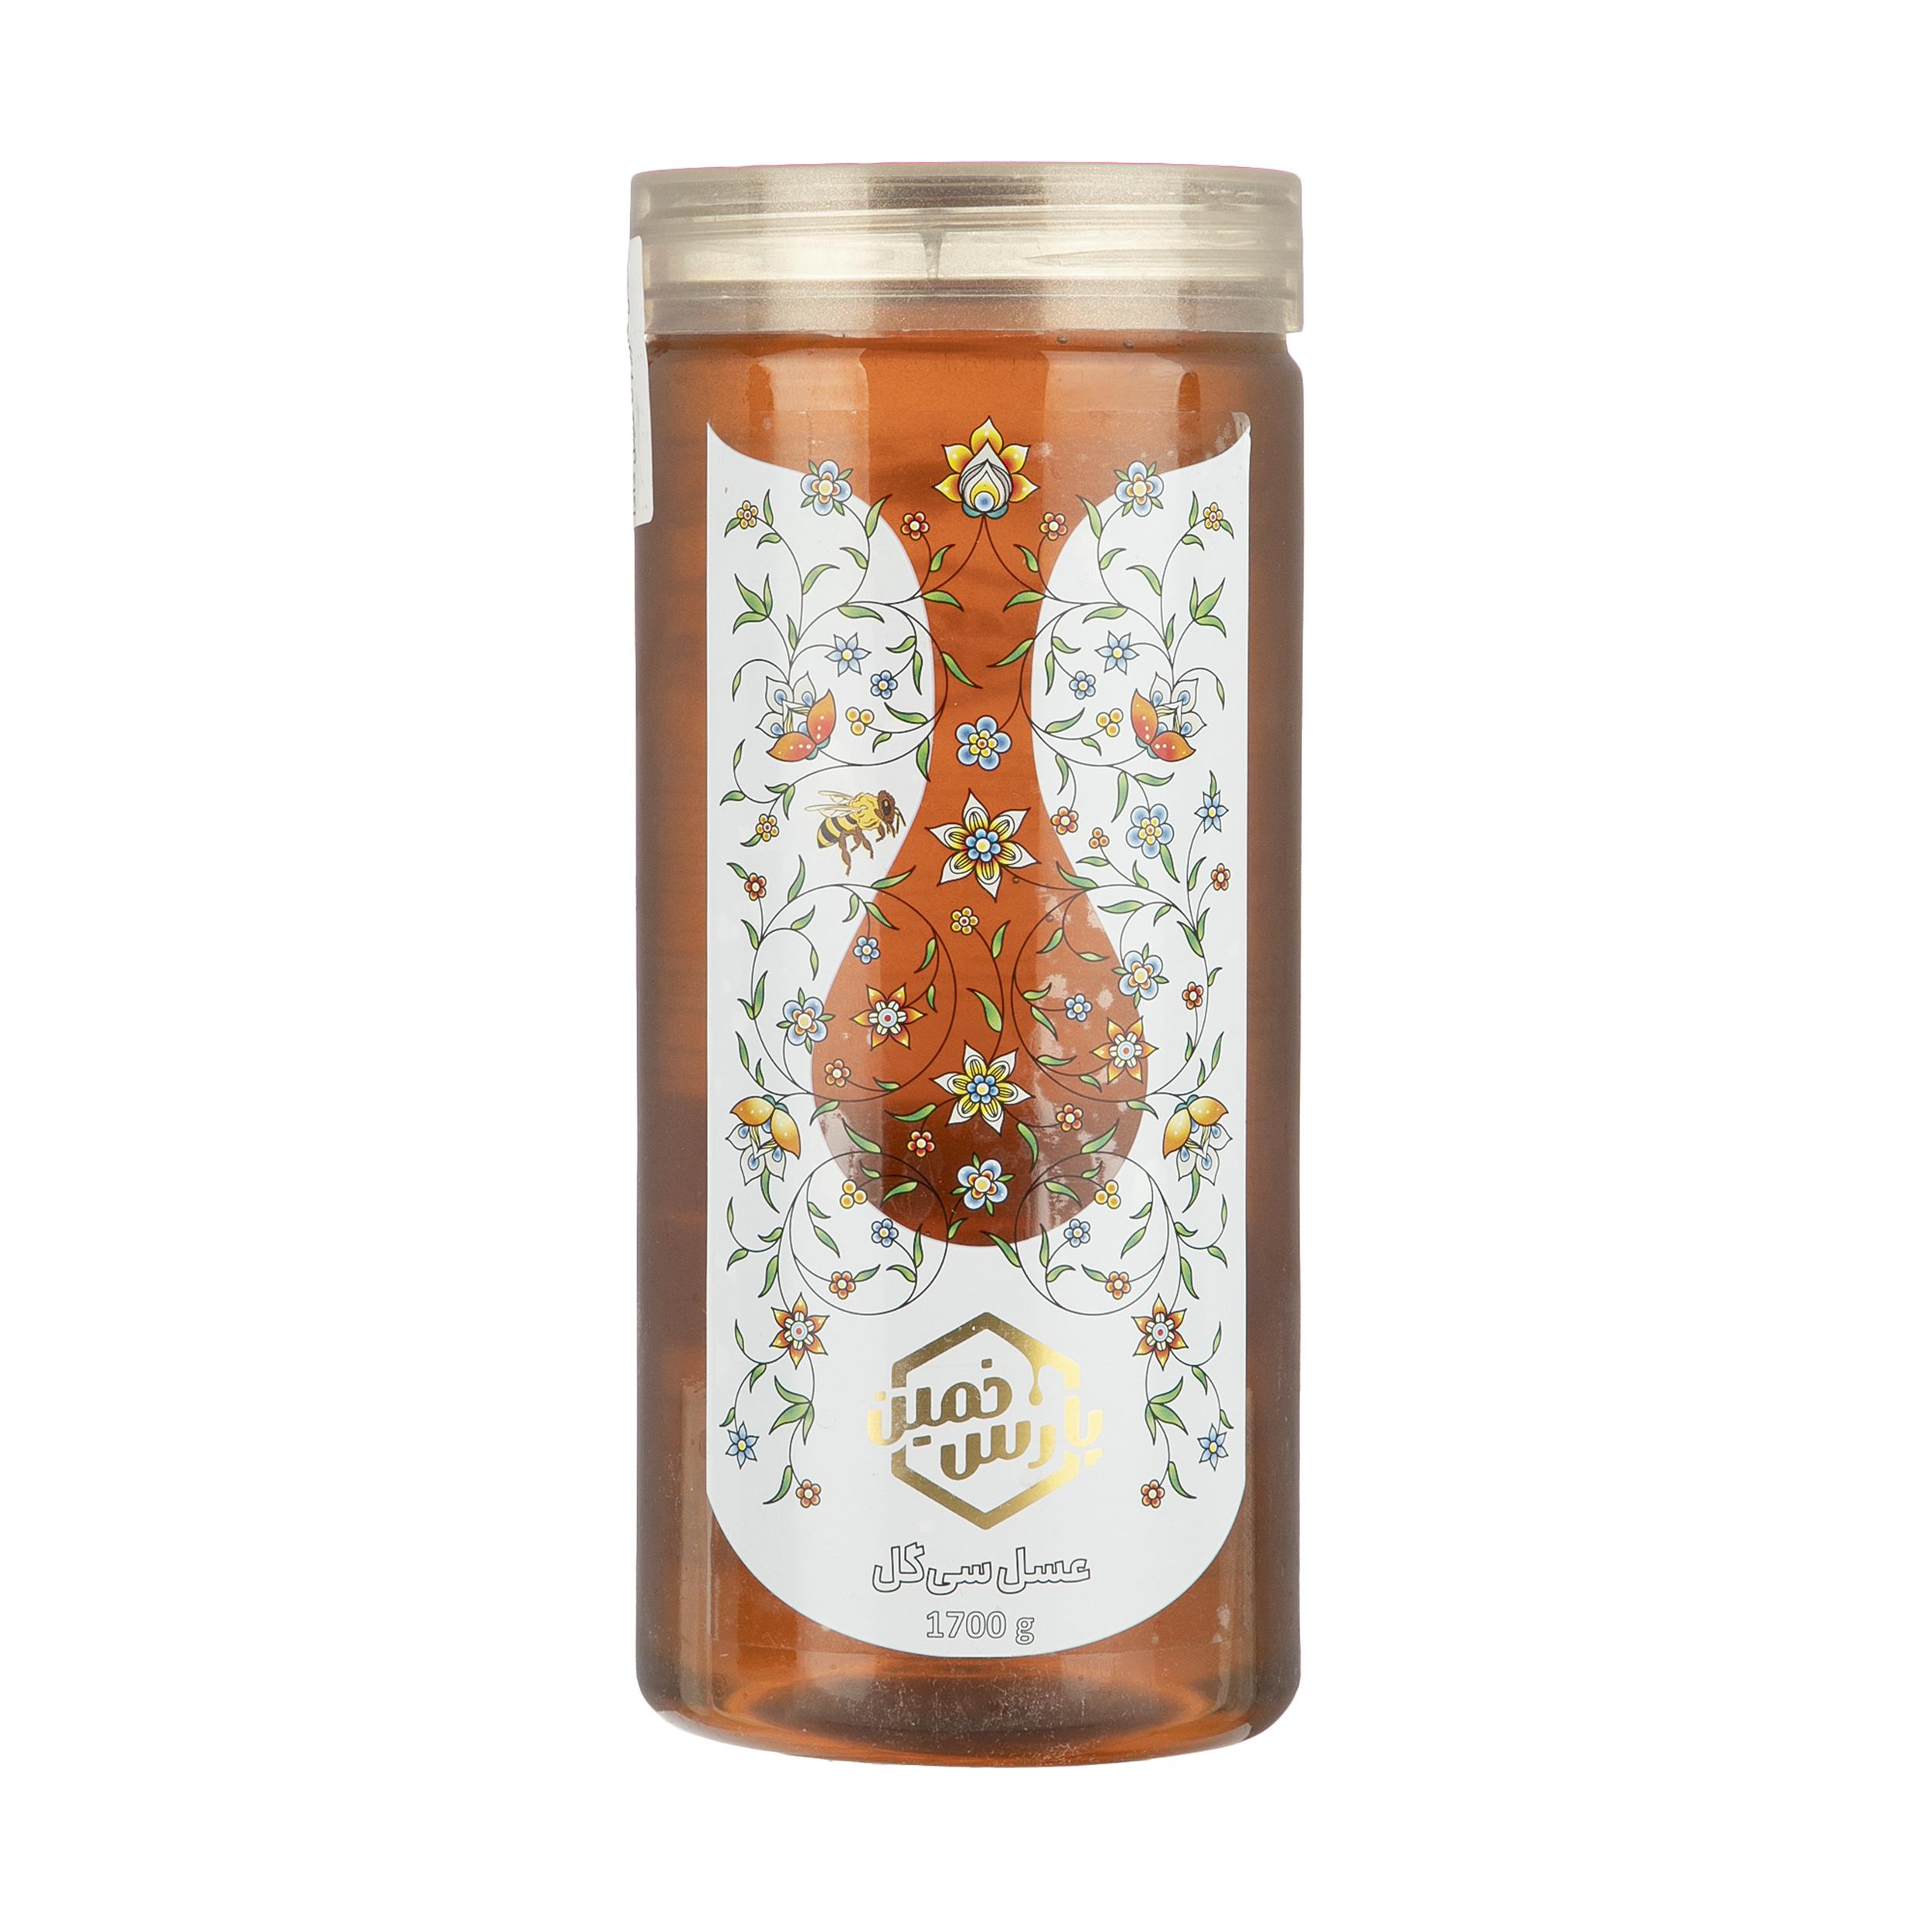 عسل سی گل پارس خمین - 1700 گرم